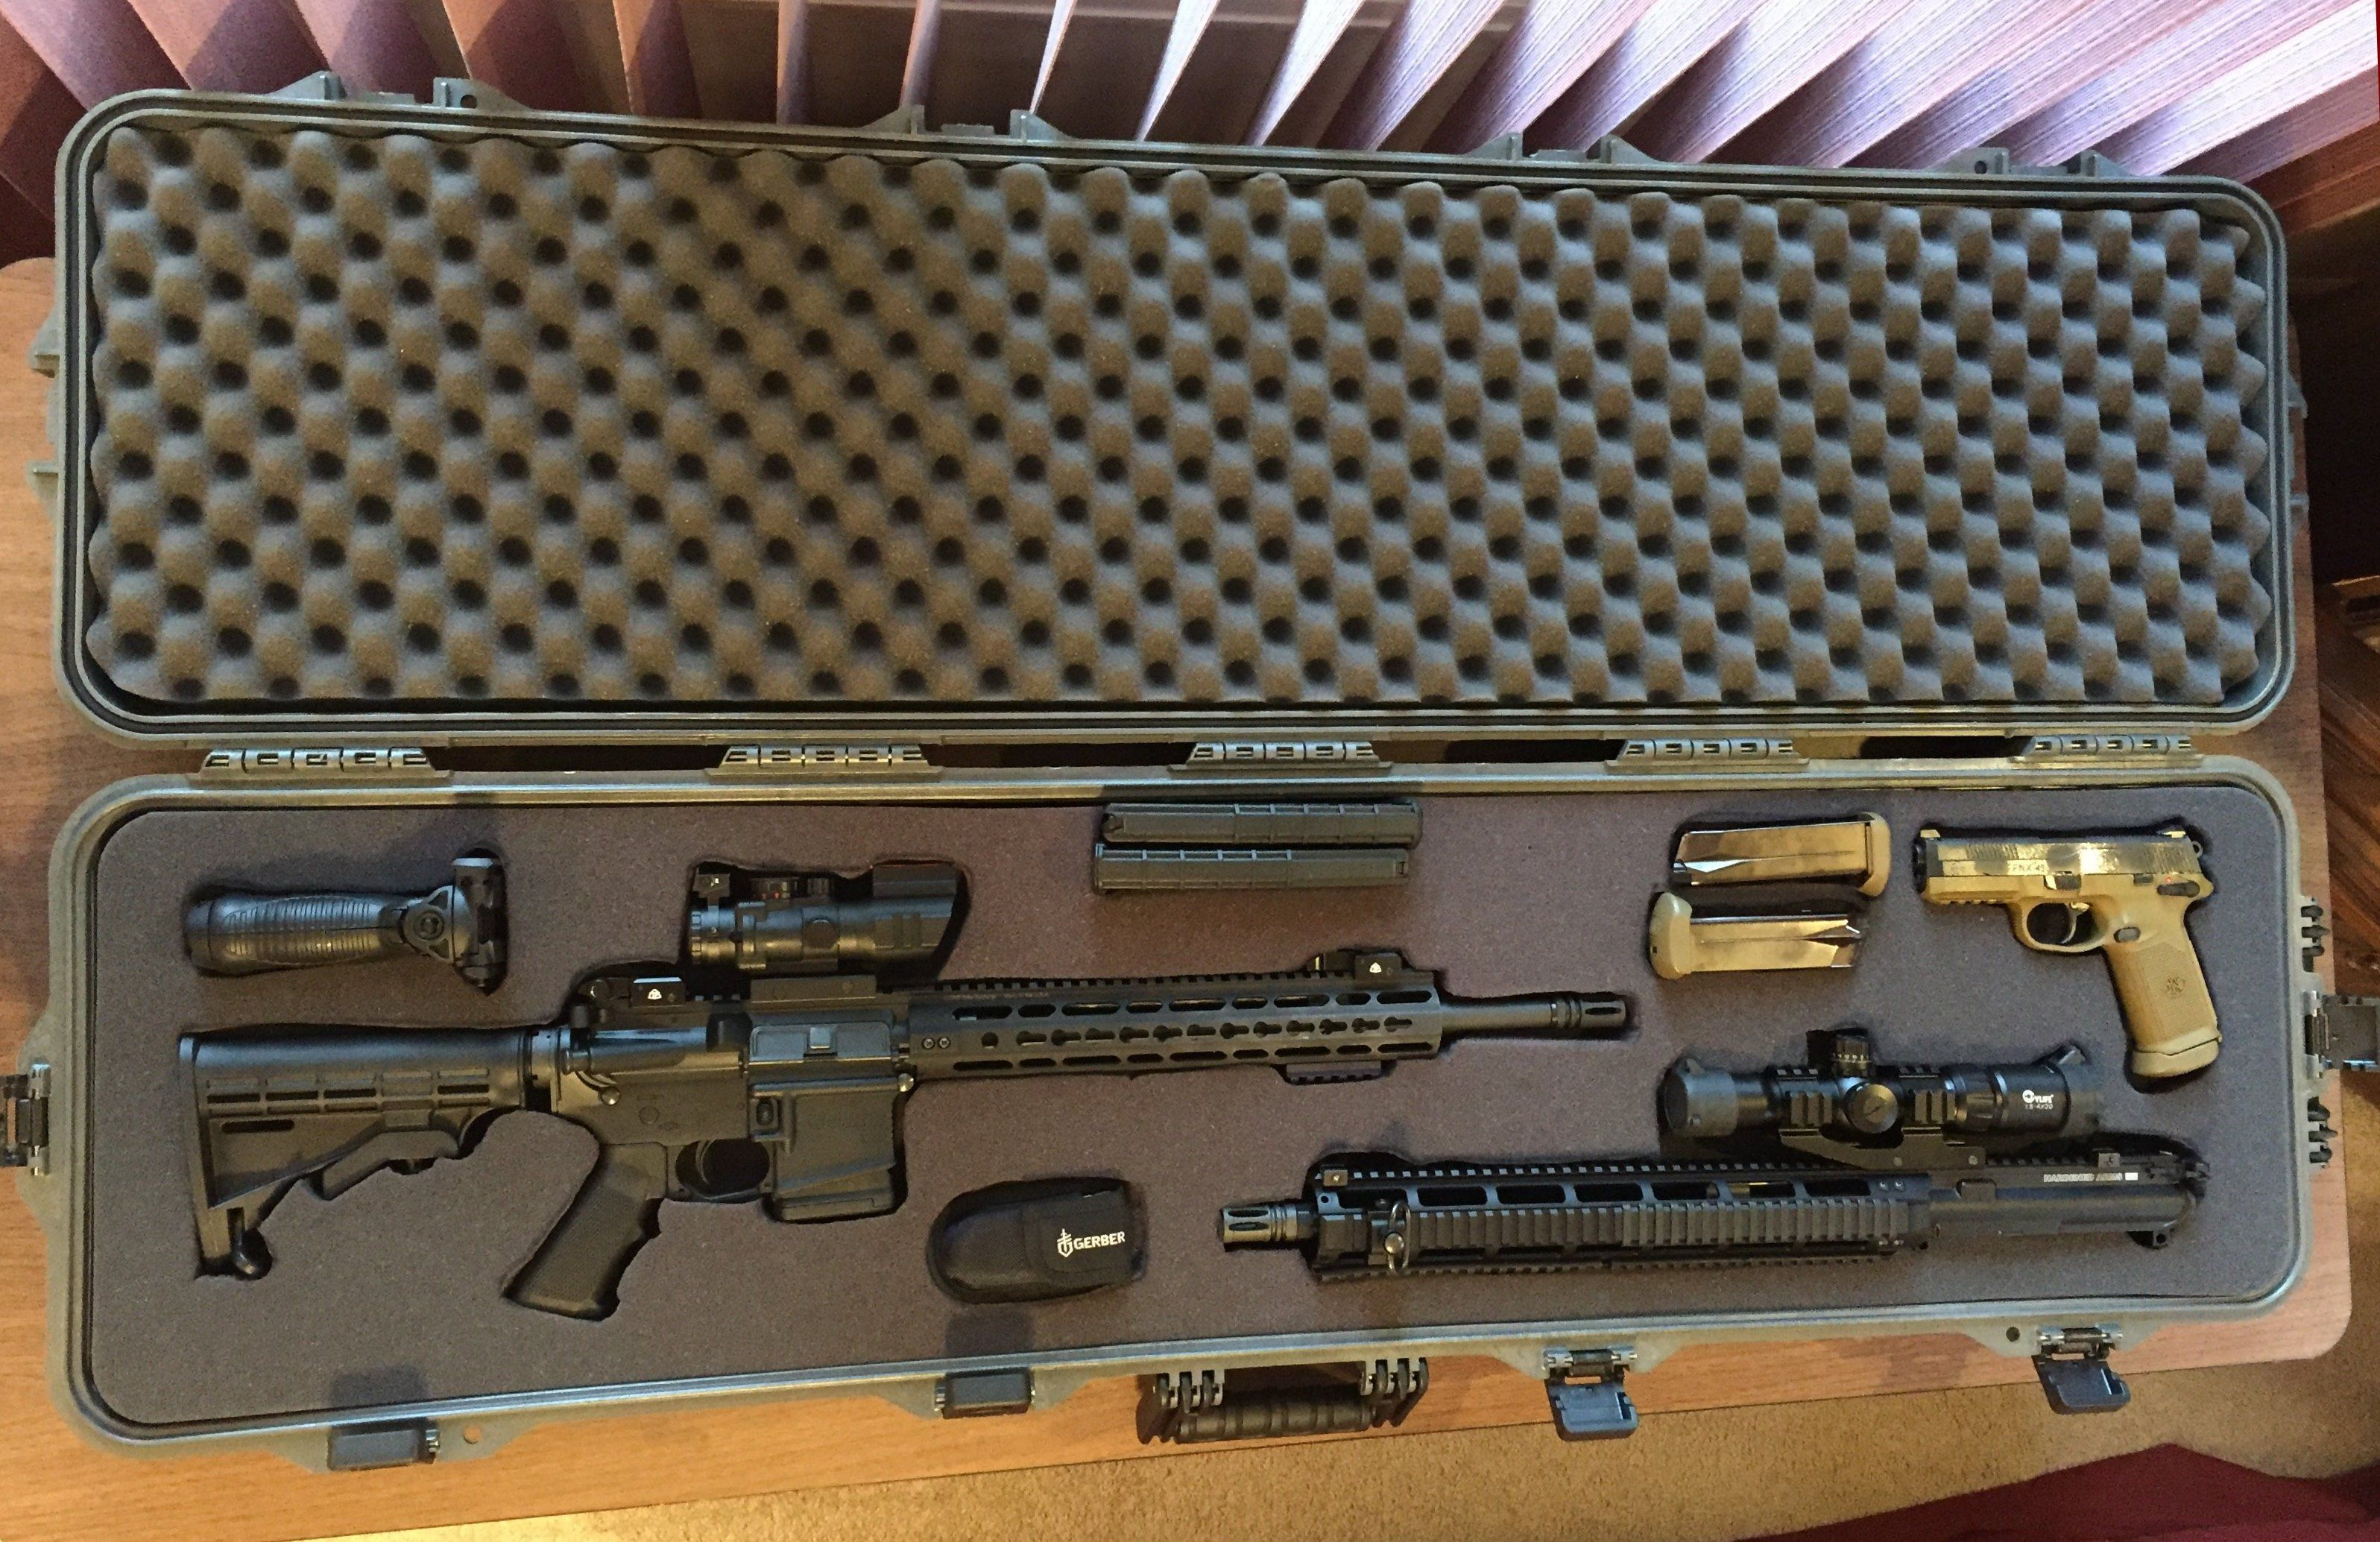 AR 15, 300 Blackout Upper, FN FNX 45 and Case | BANG!! | 300